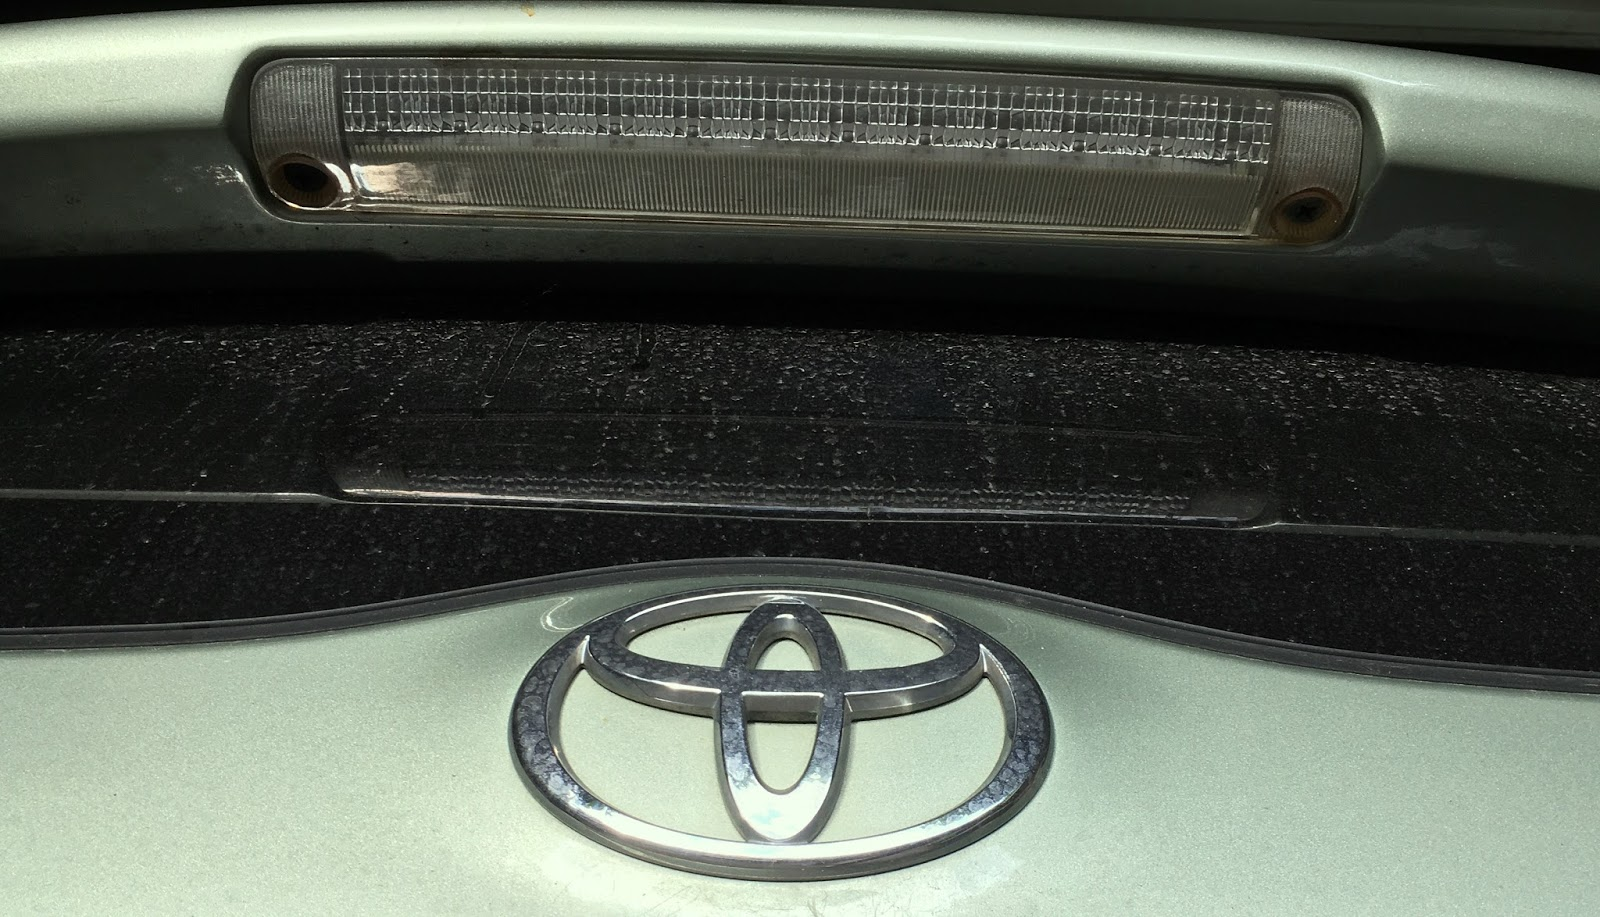 Toyota S Sticky 2007 Prius Hatch Problem